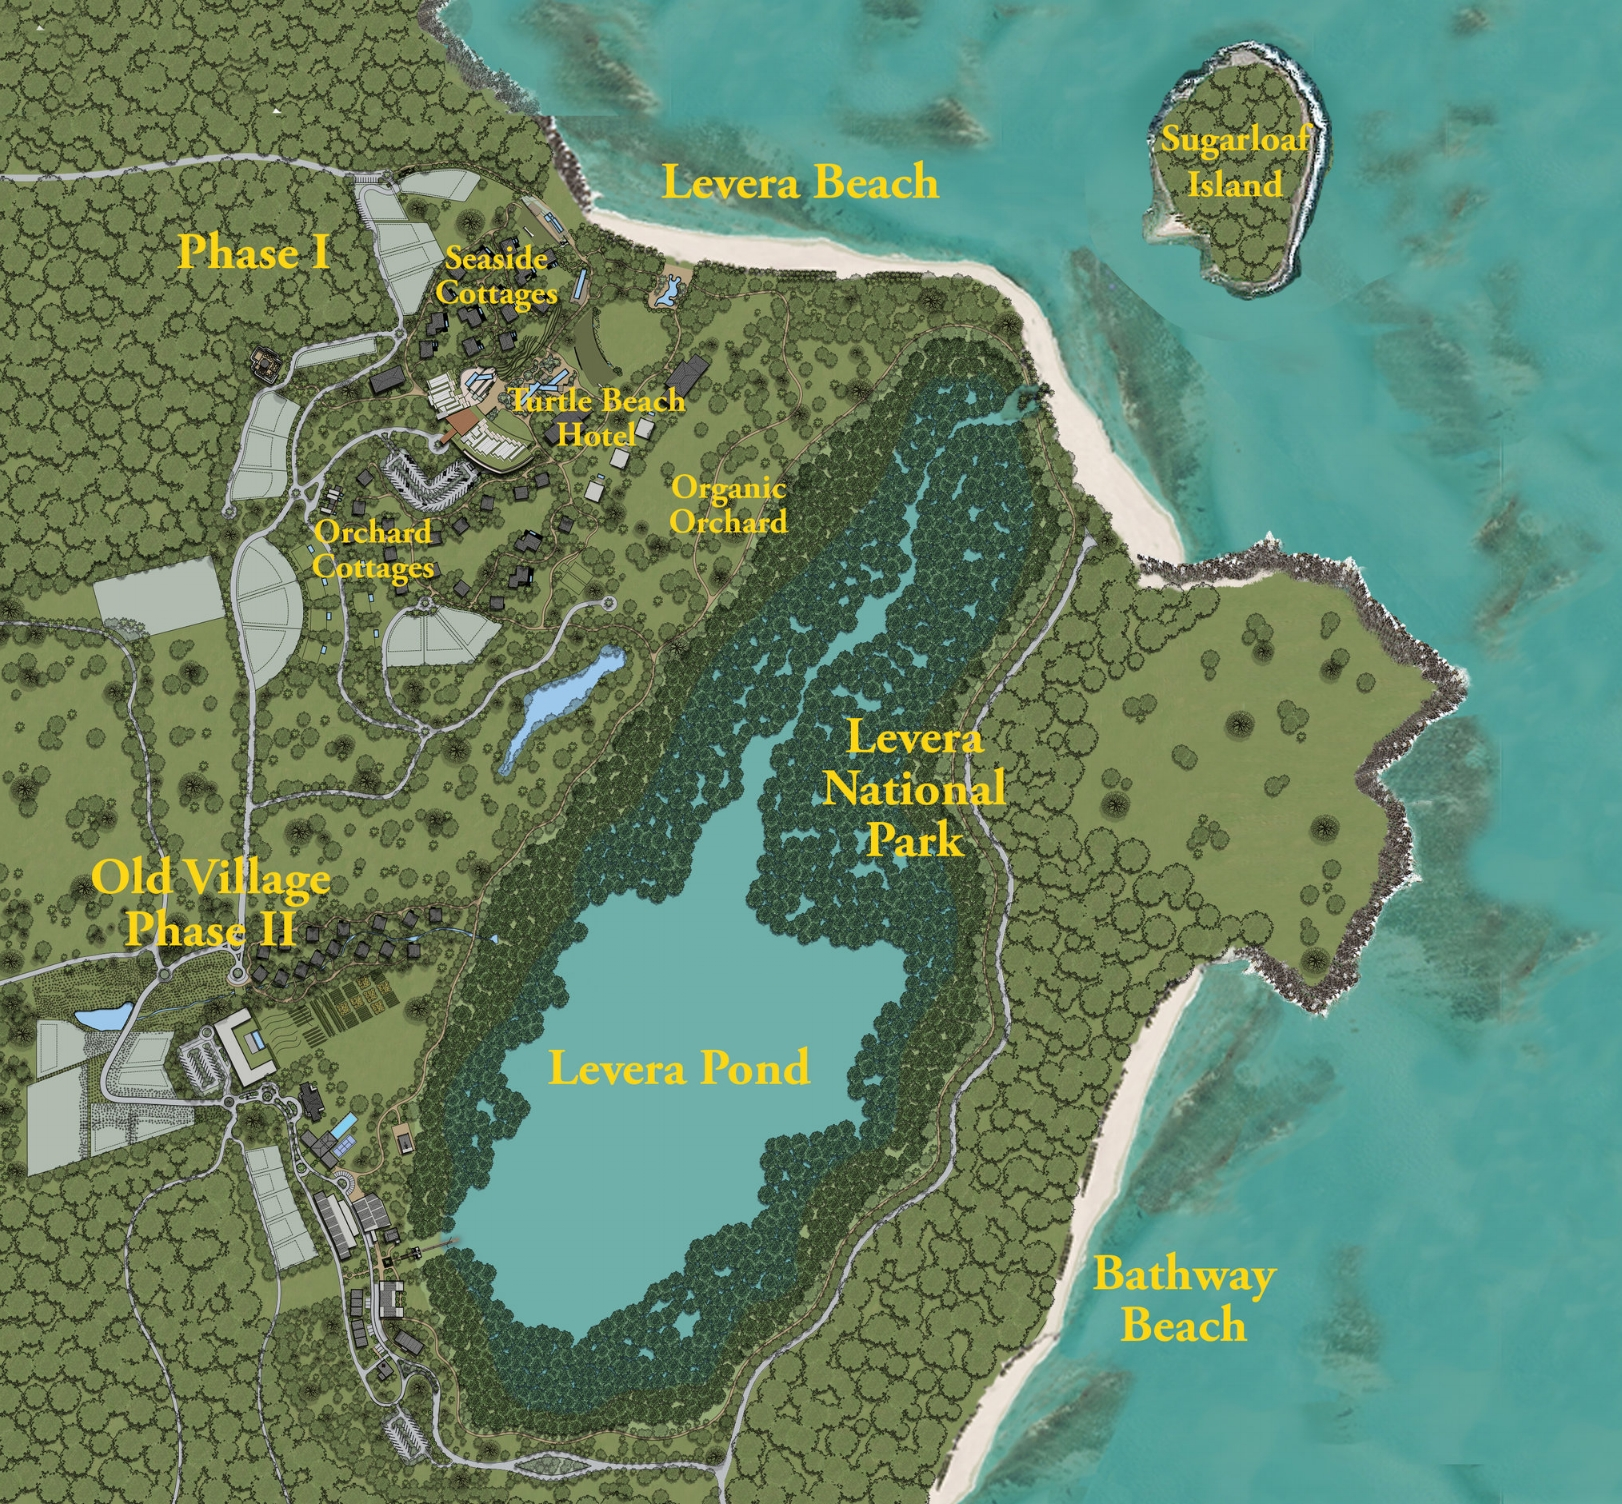 map phase 1&2.jpg